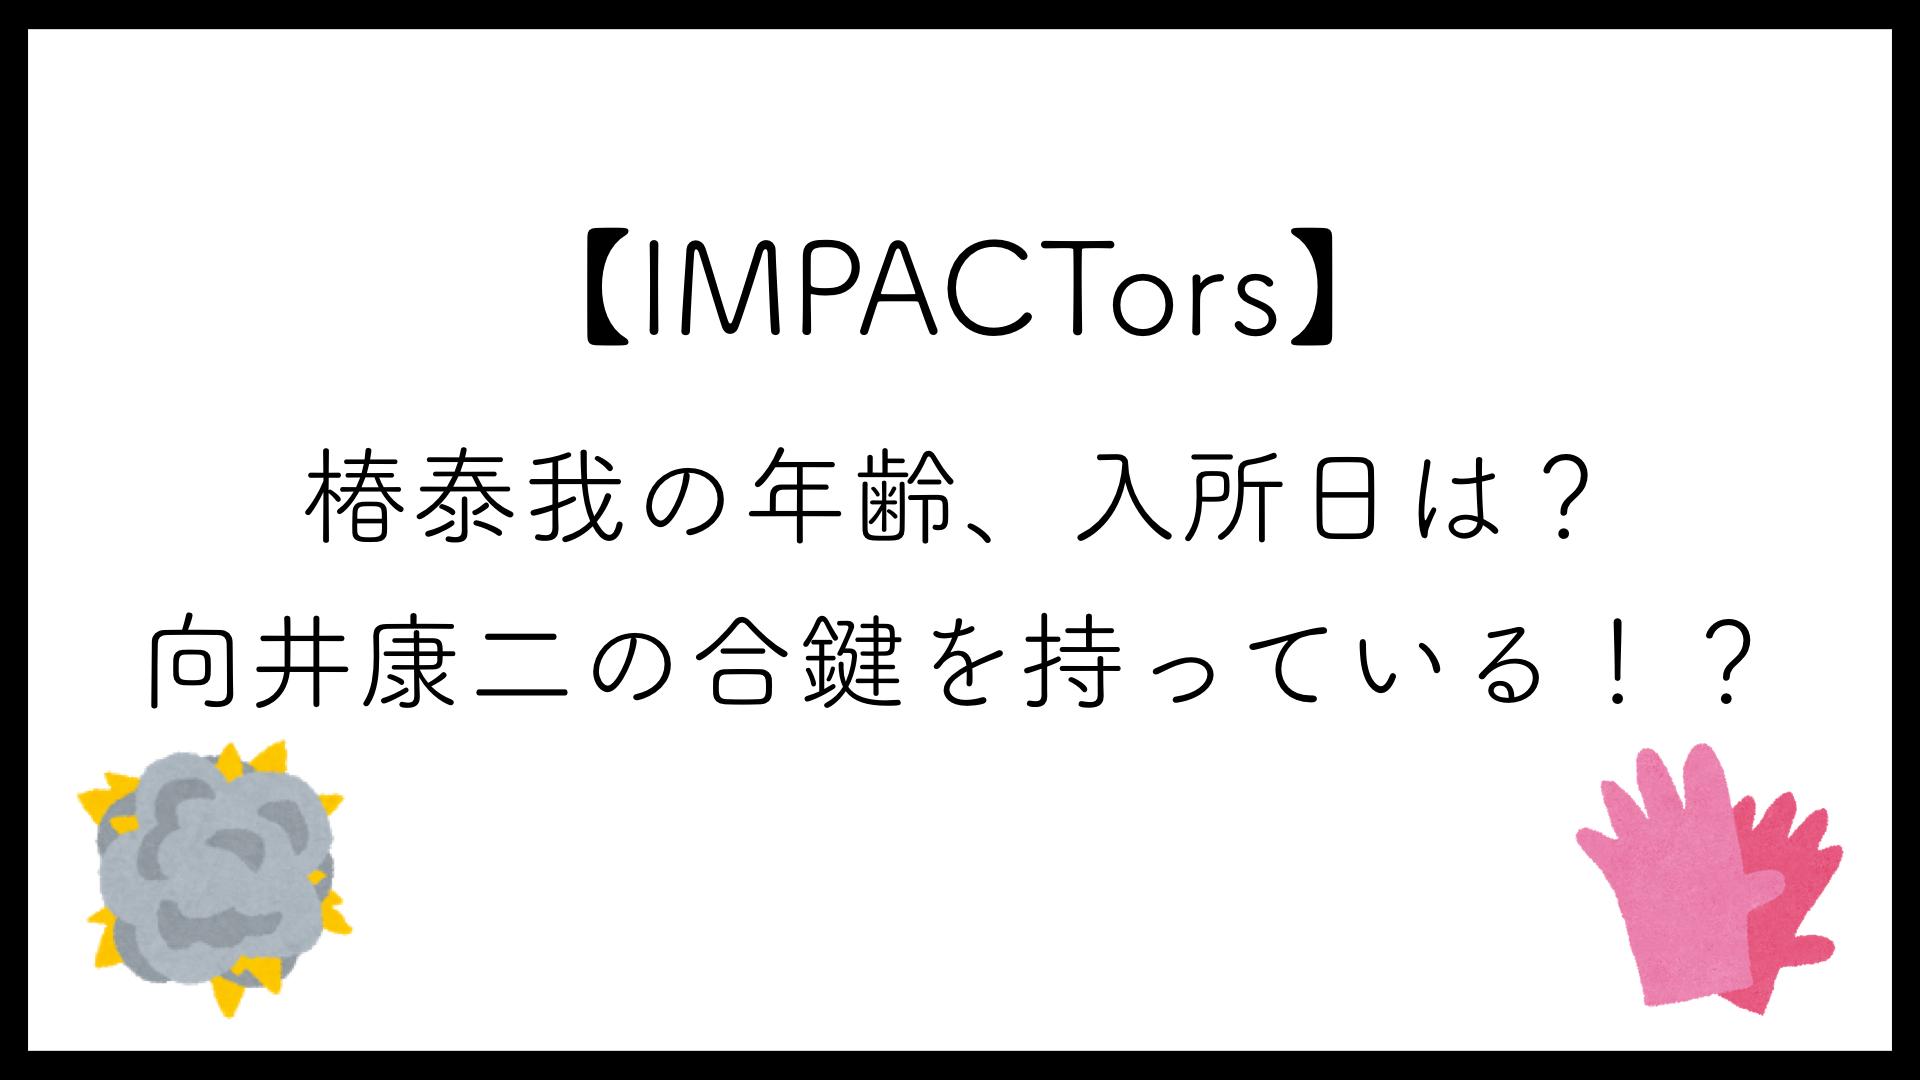 【IMPACTors】椿泰我の年齢、入所日は?向井康二の合鍵を持っている!?